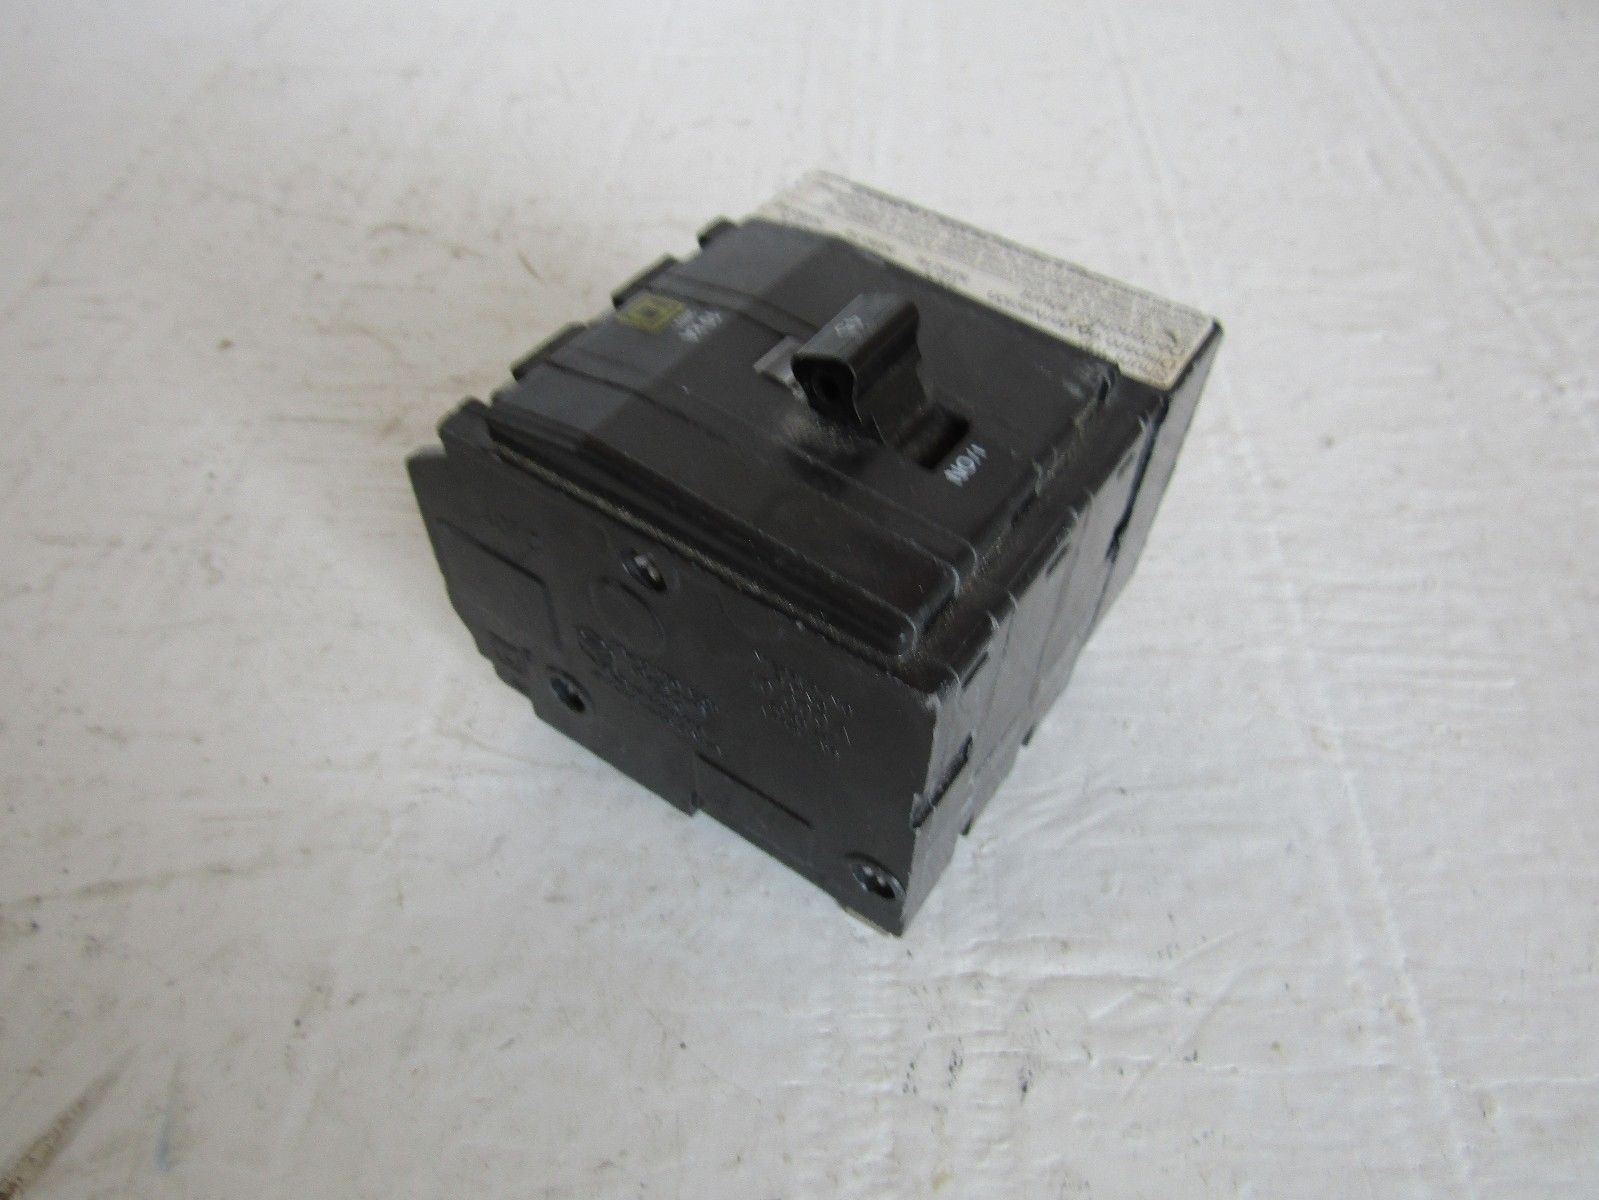 480 volt shunt trip wiring diagram square d qo3451021 3 pole 45 amp 240 volt qo shunt trip ... 480 volt 1 phase wiring diagram